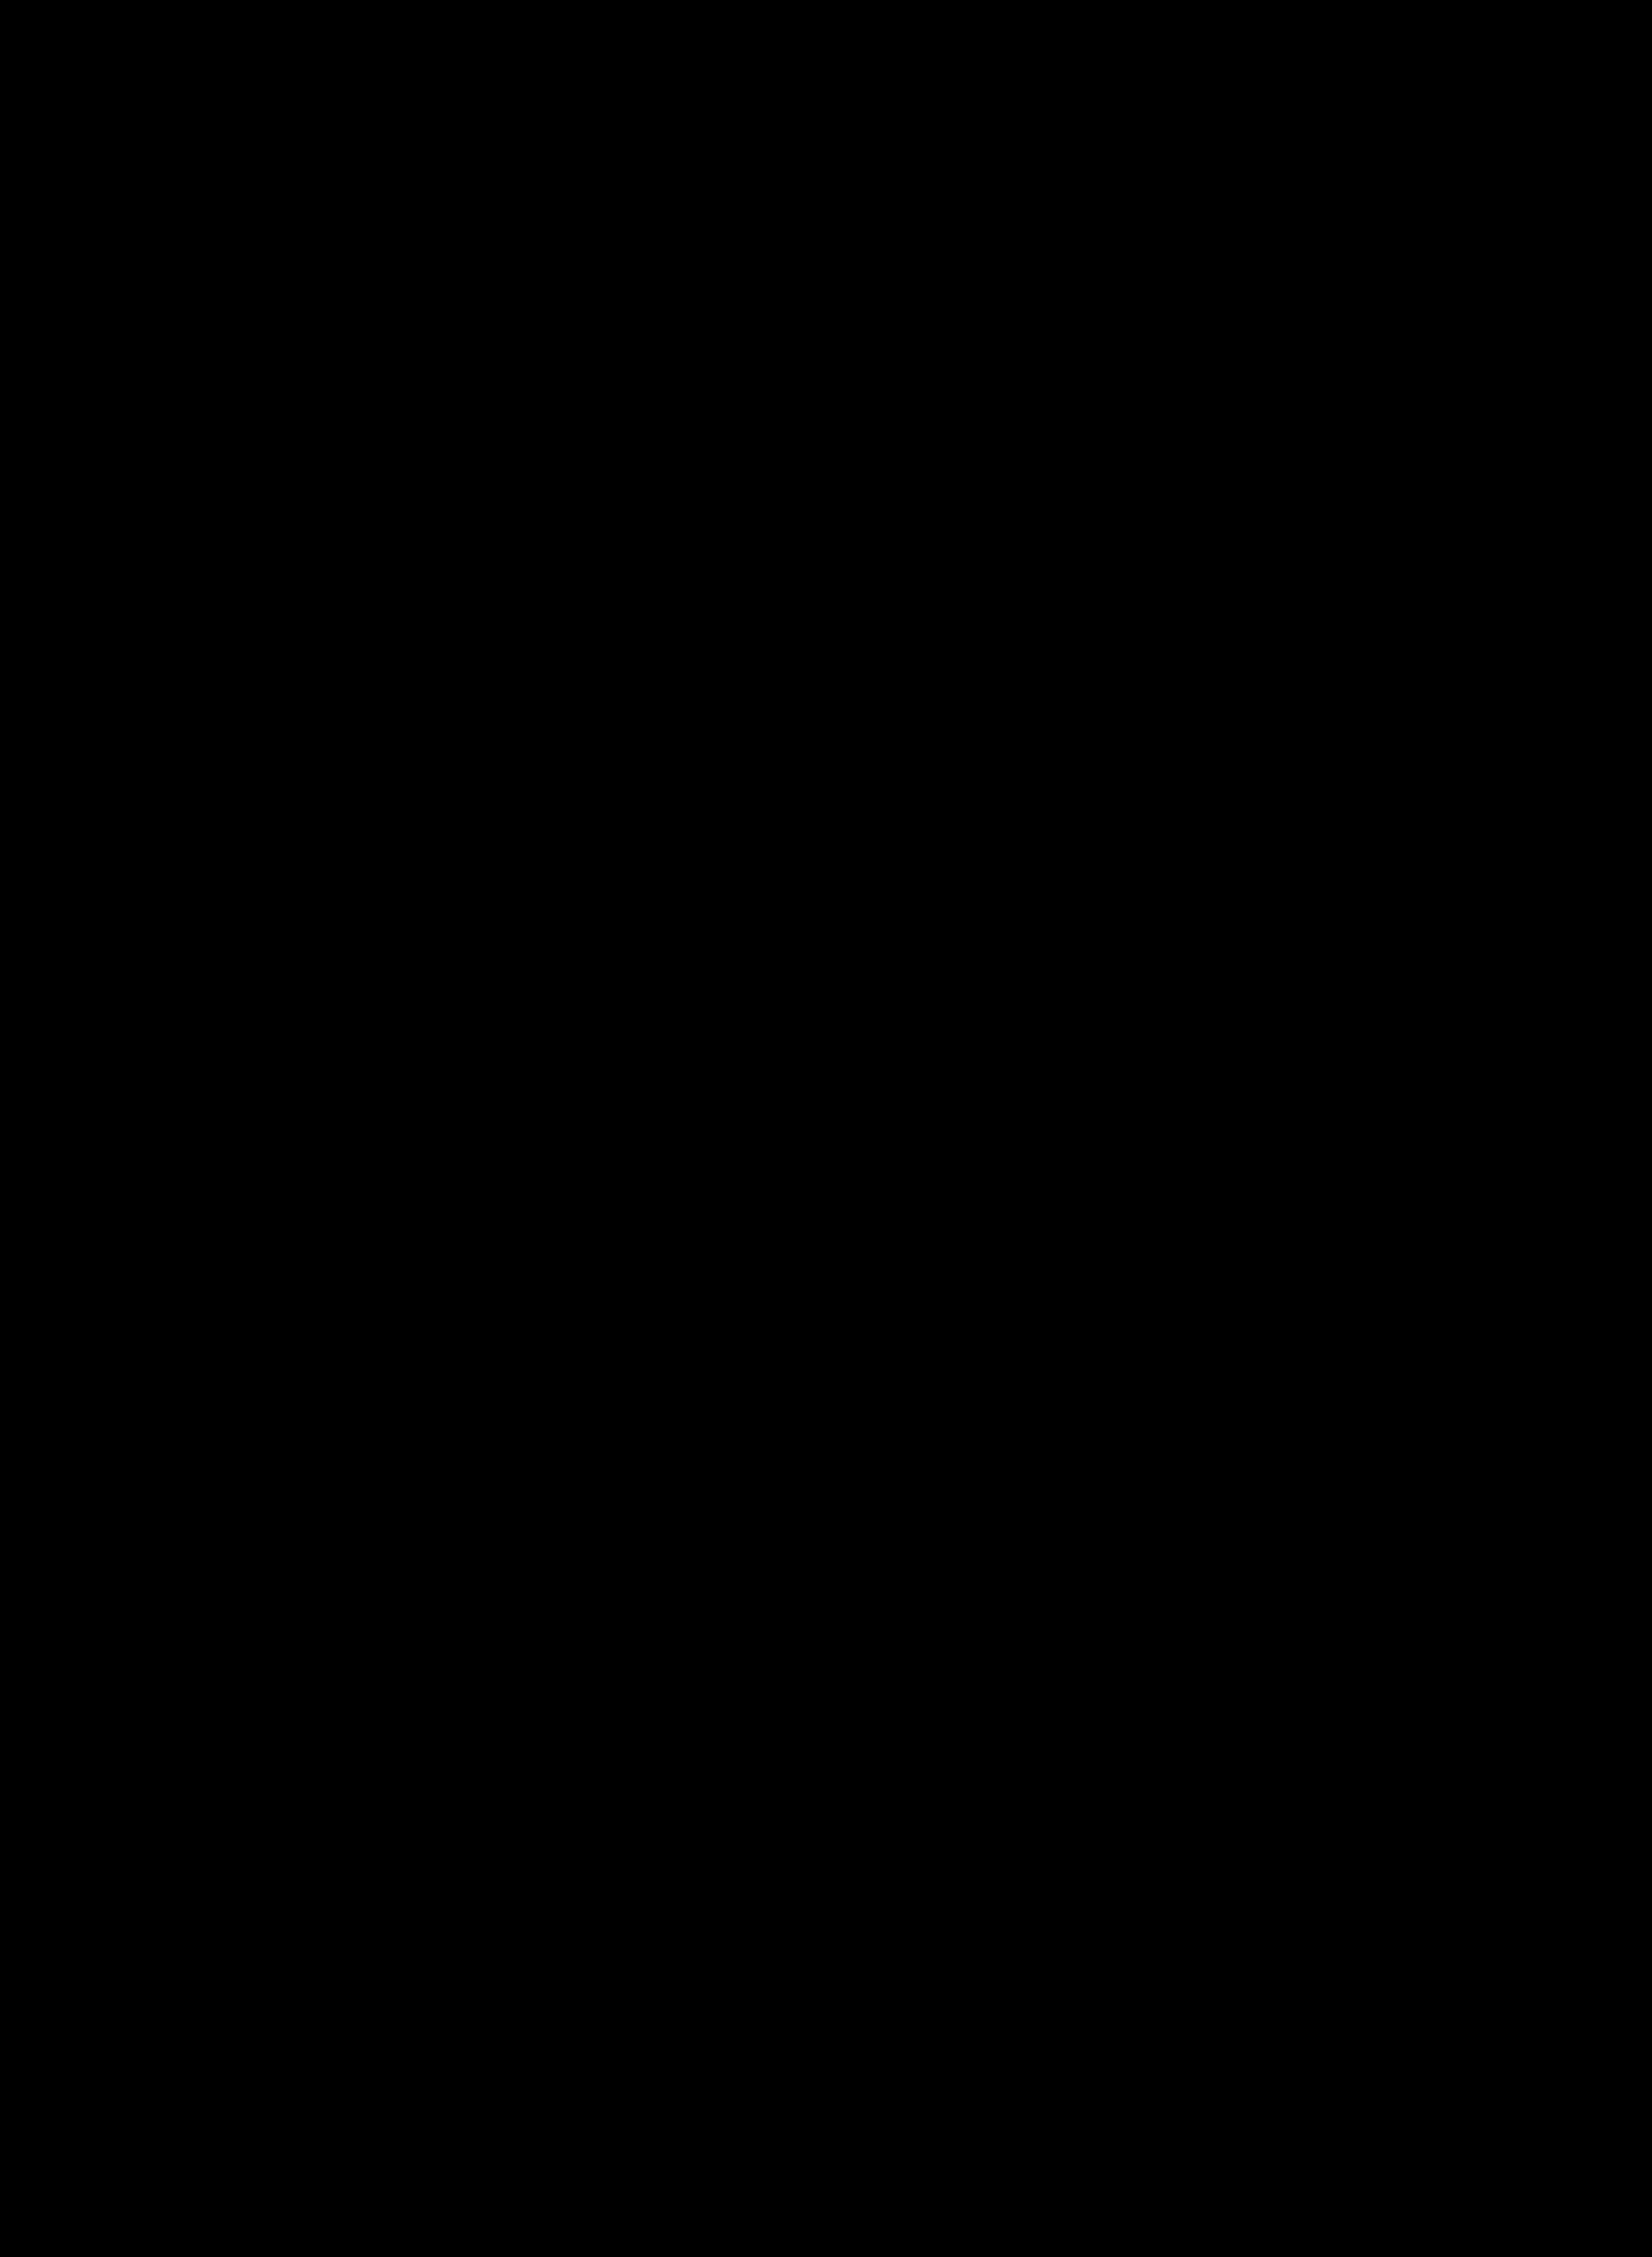 Oval shield big image. Shapes clipart circle